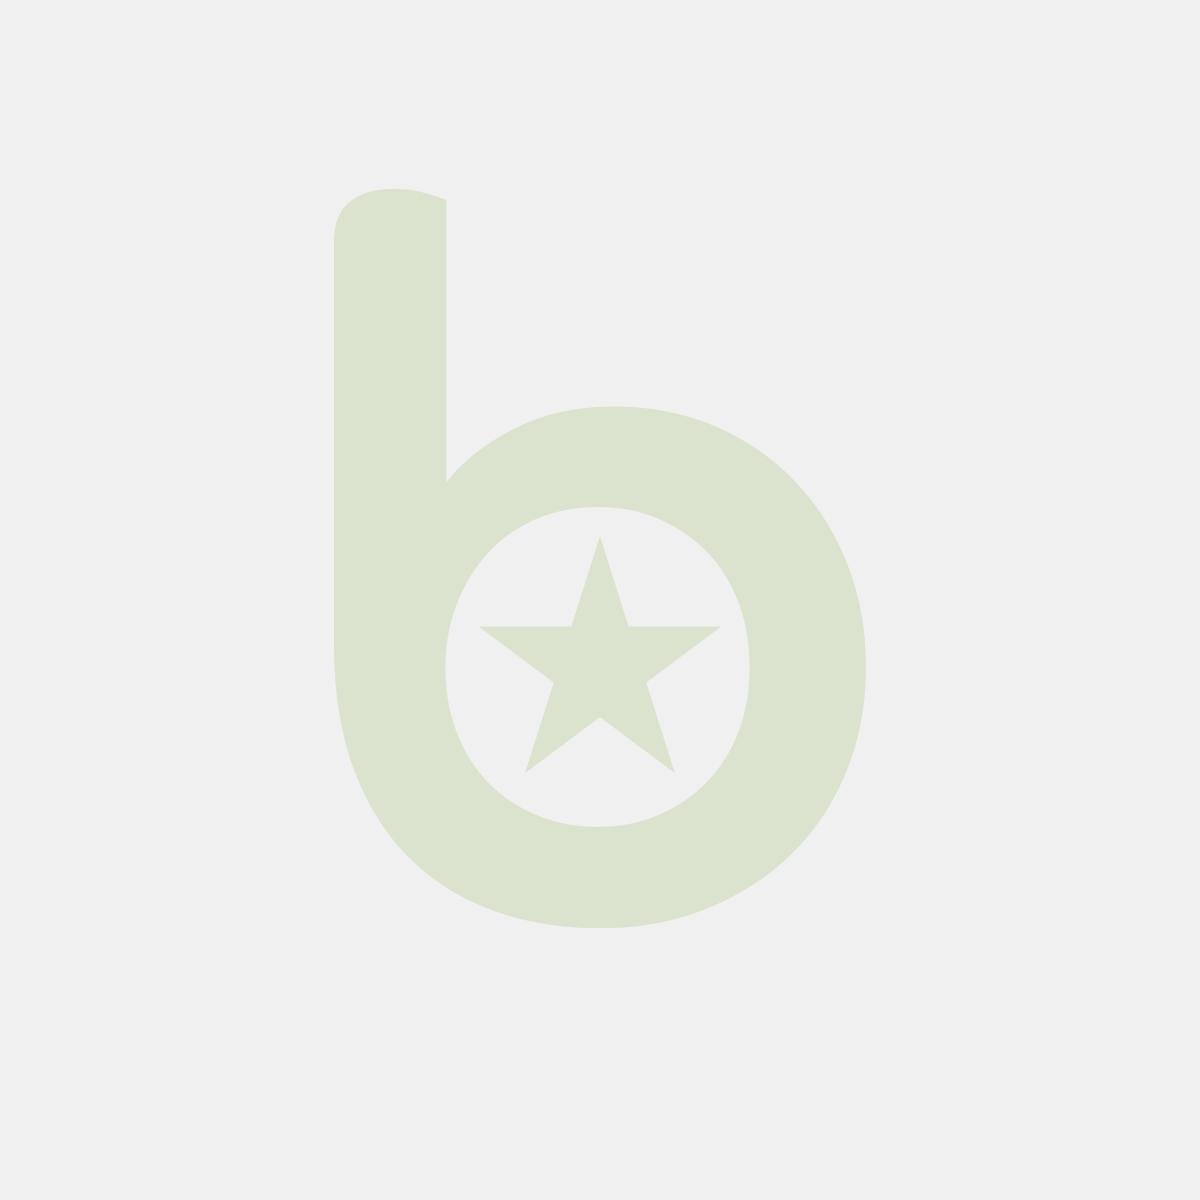 Pojemnik Gn 1/6 - 176X162 Mm 65